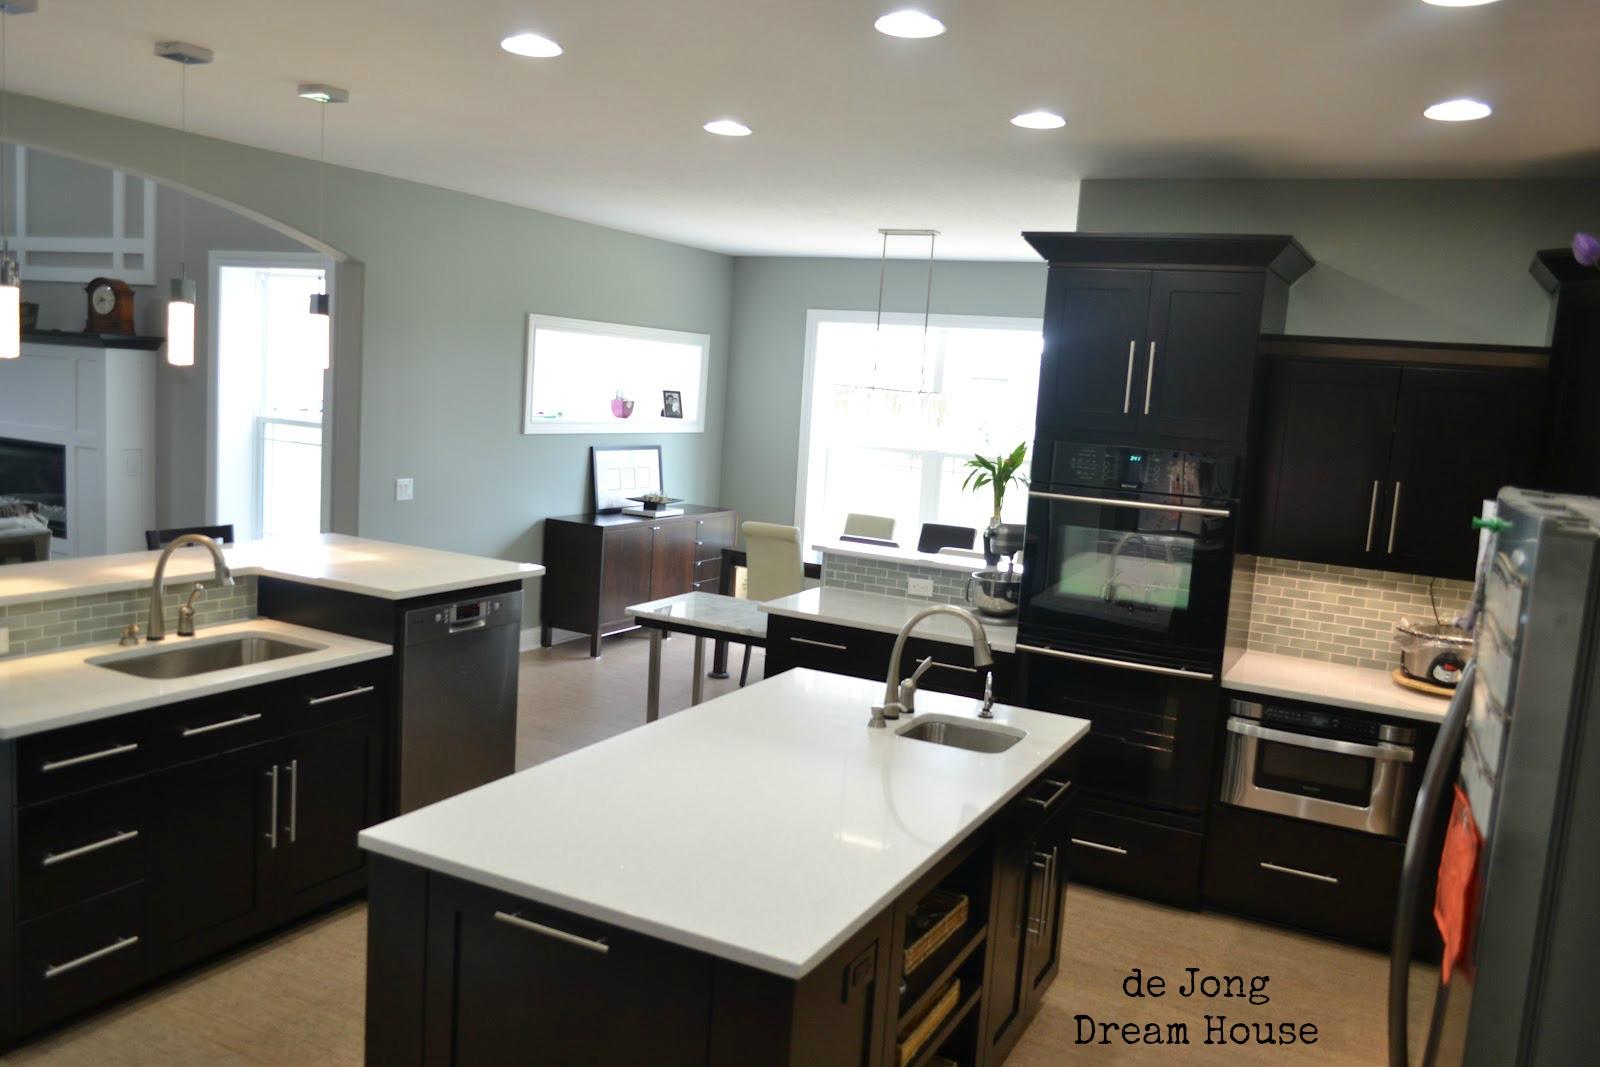 Lighting Basement Washroom Stairs: De Jong Dream House: Introducing...our Dream Kitchen